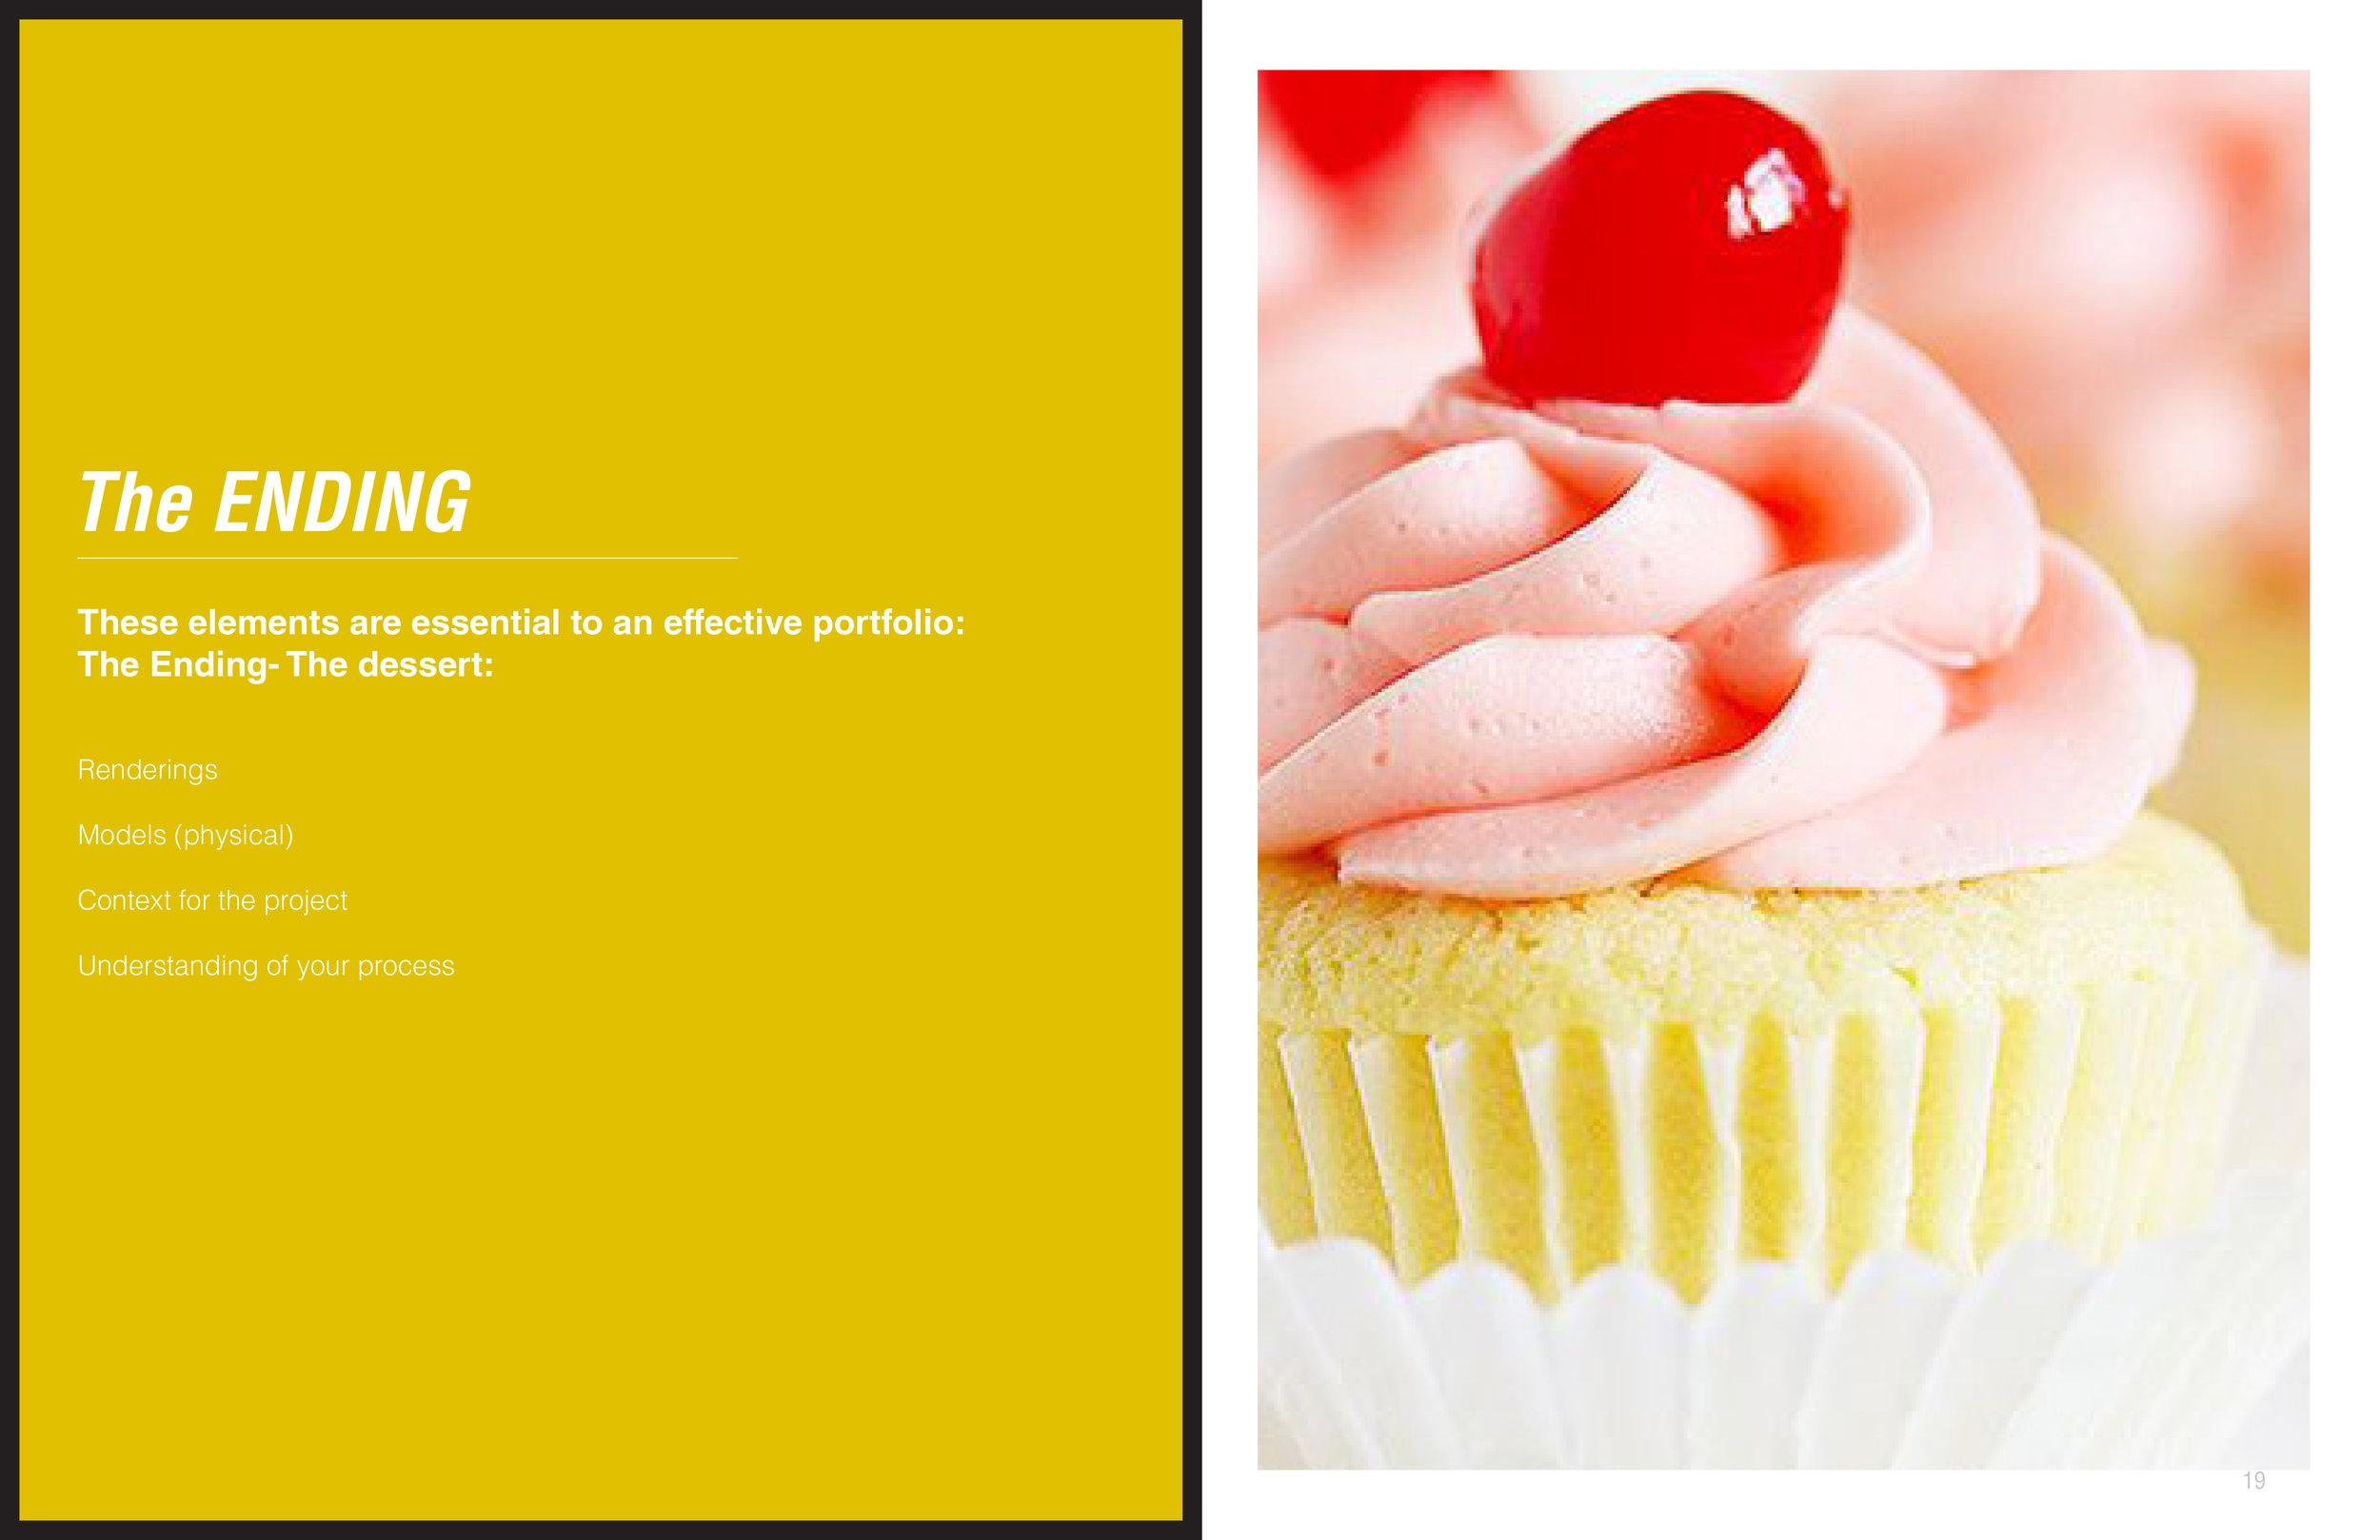 Interior_Design_StoryTelling_09_16_14-19.jpg